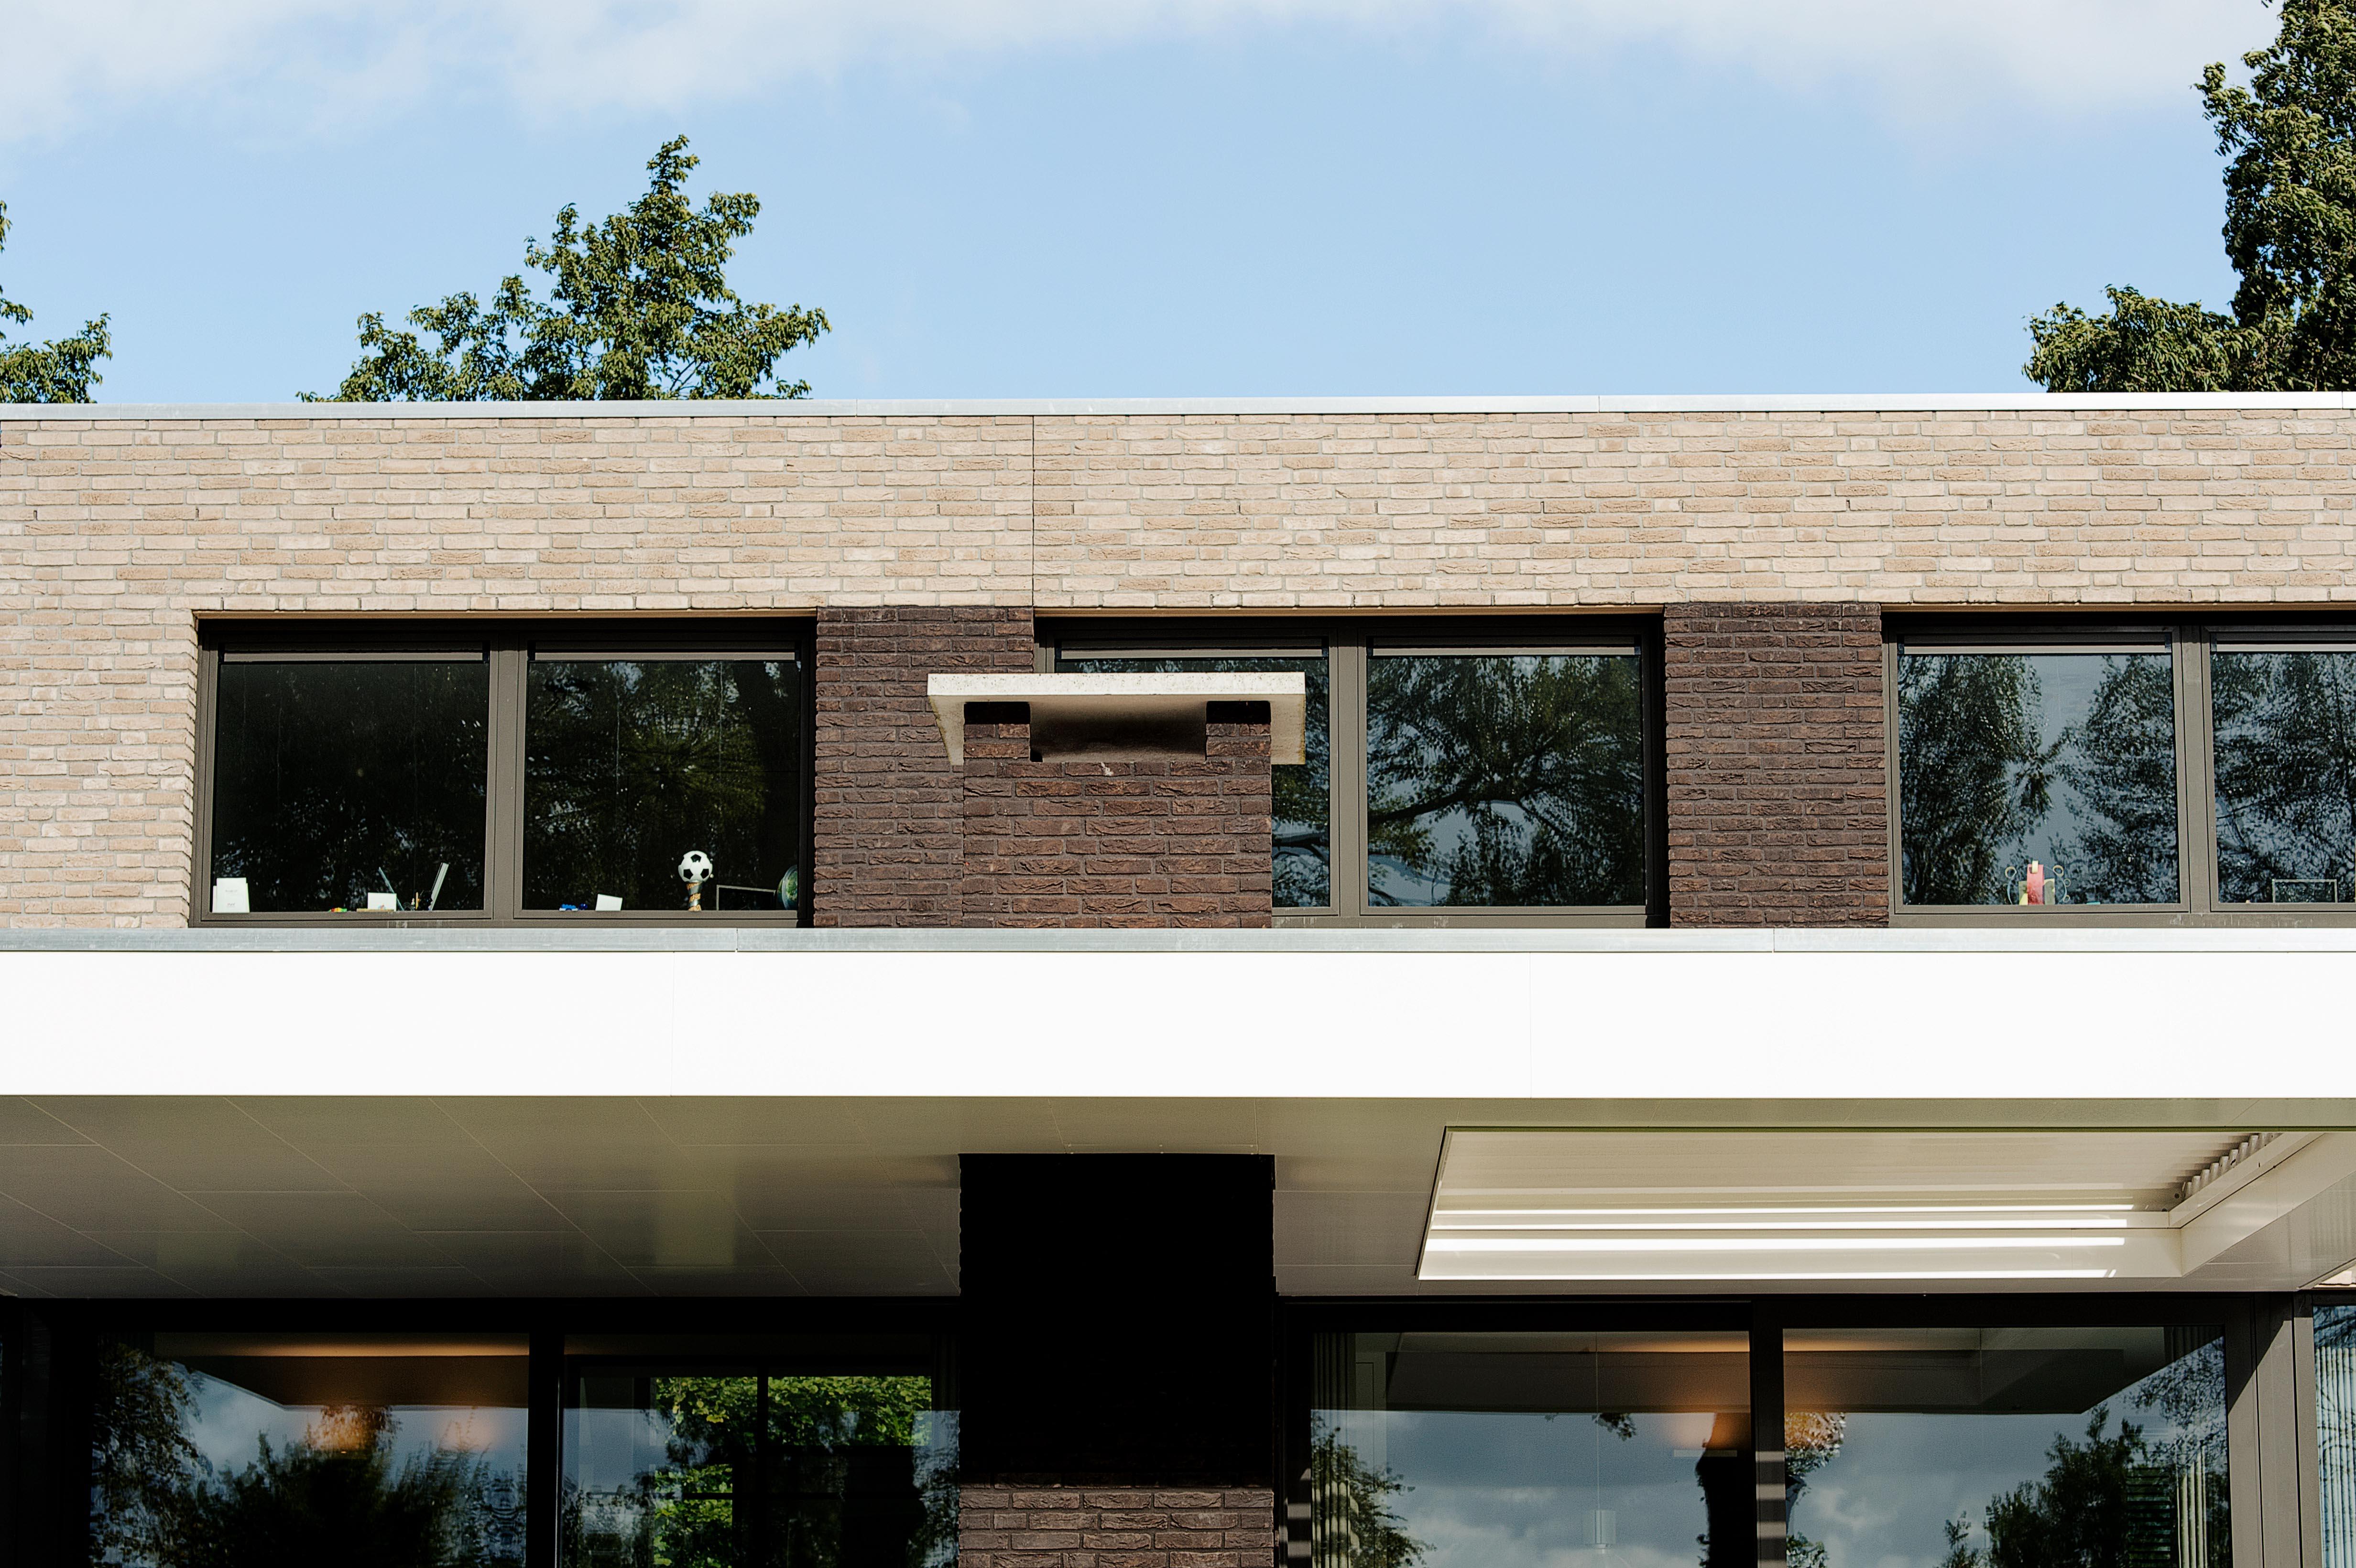 FPF_20170913_BB_Architecten_Valentijnlaan_Breda022